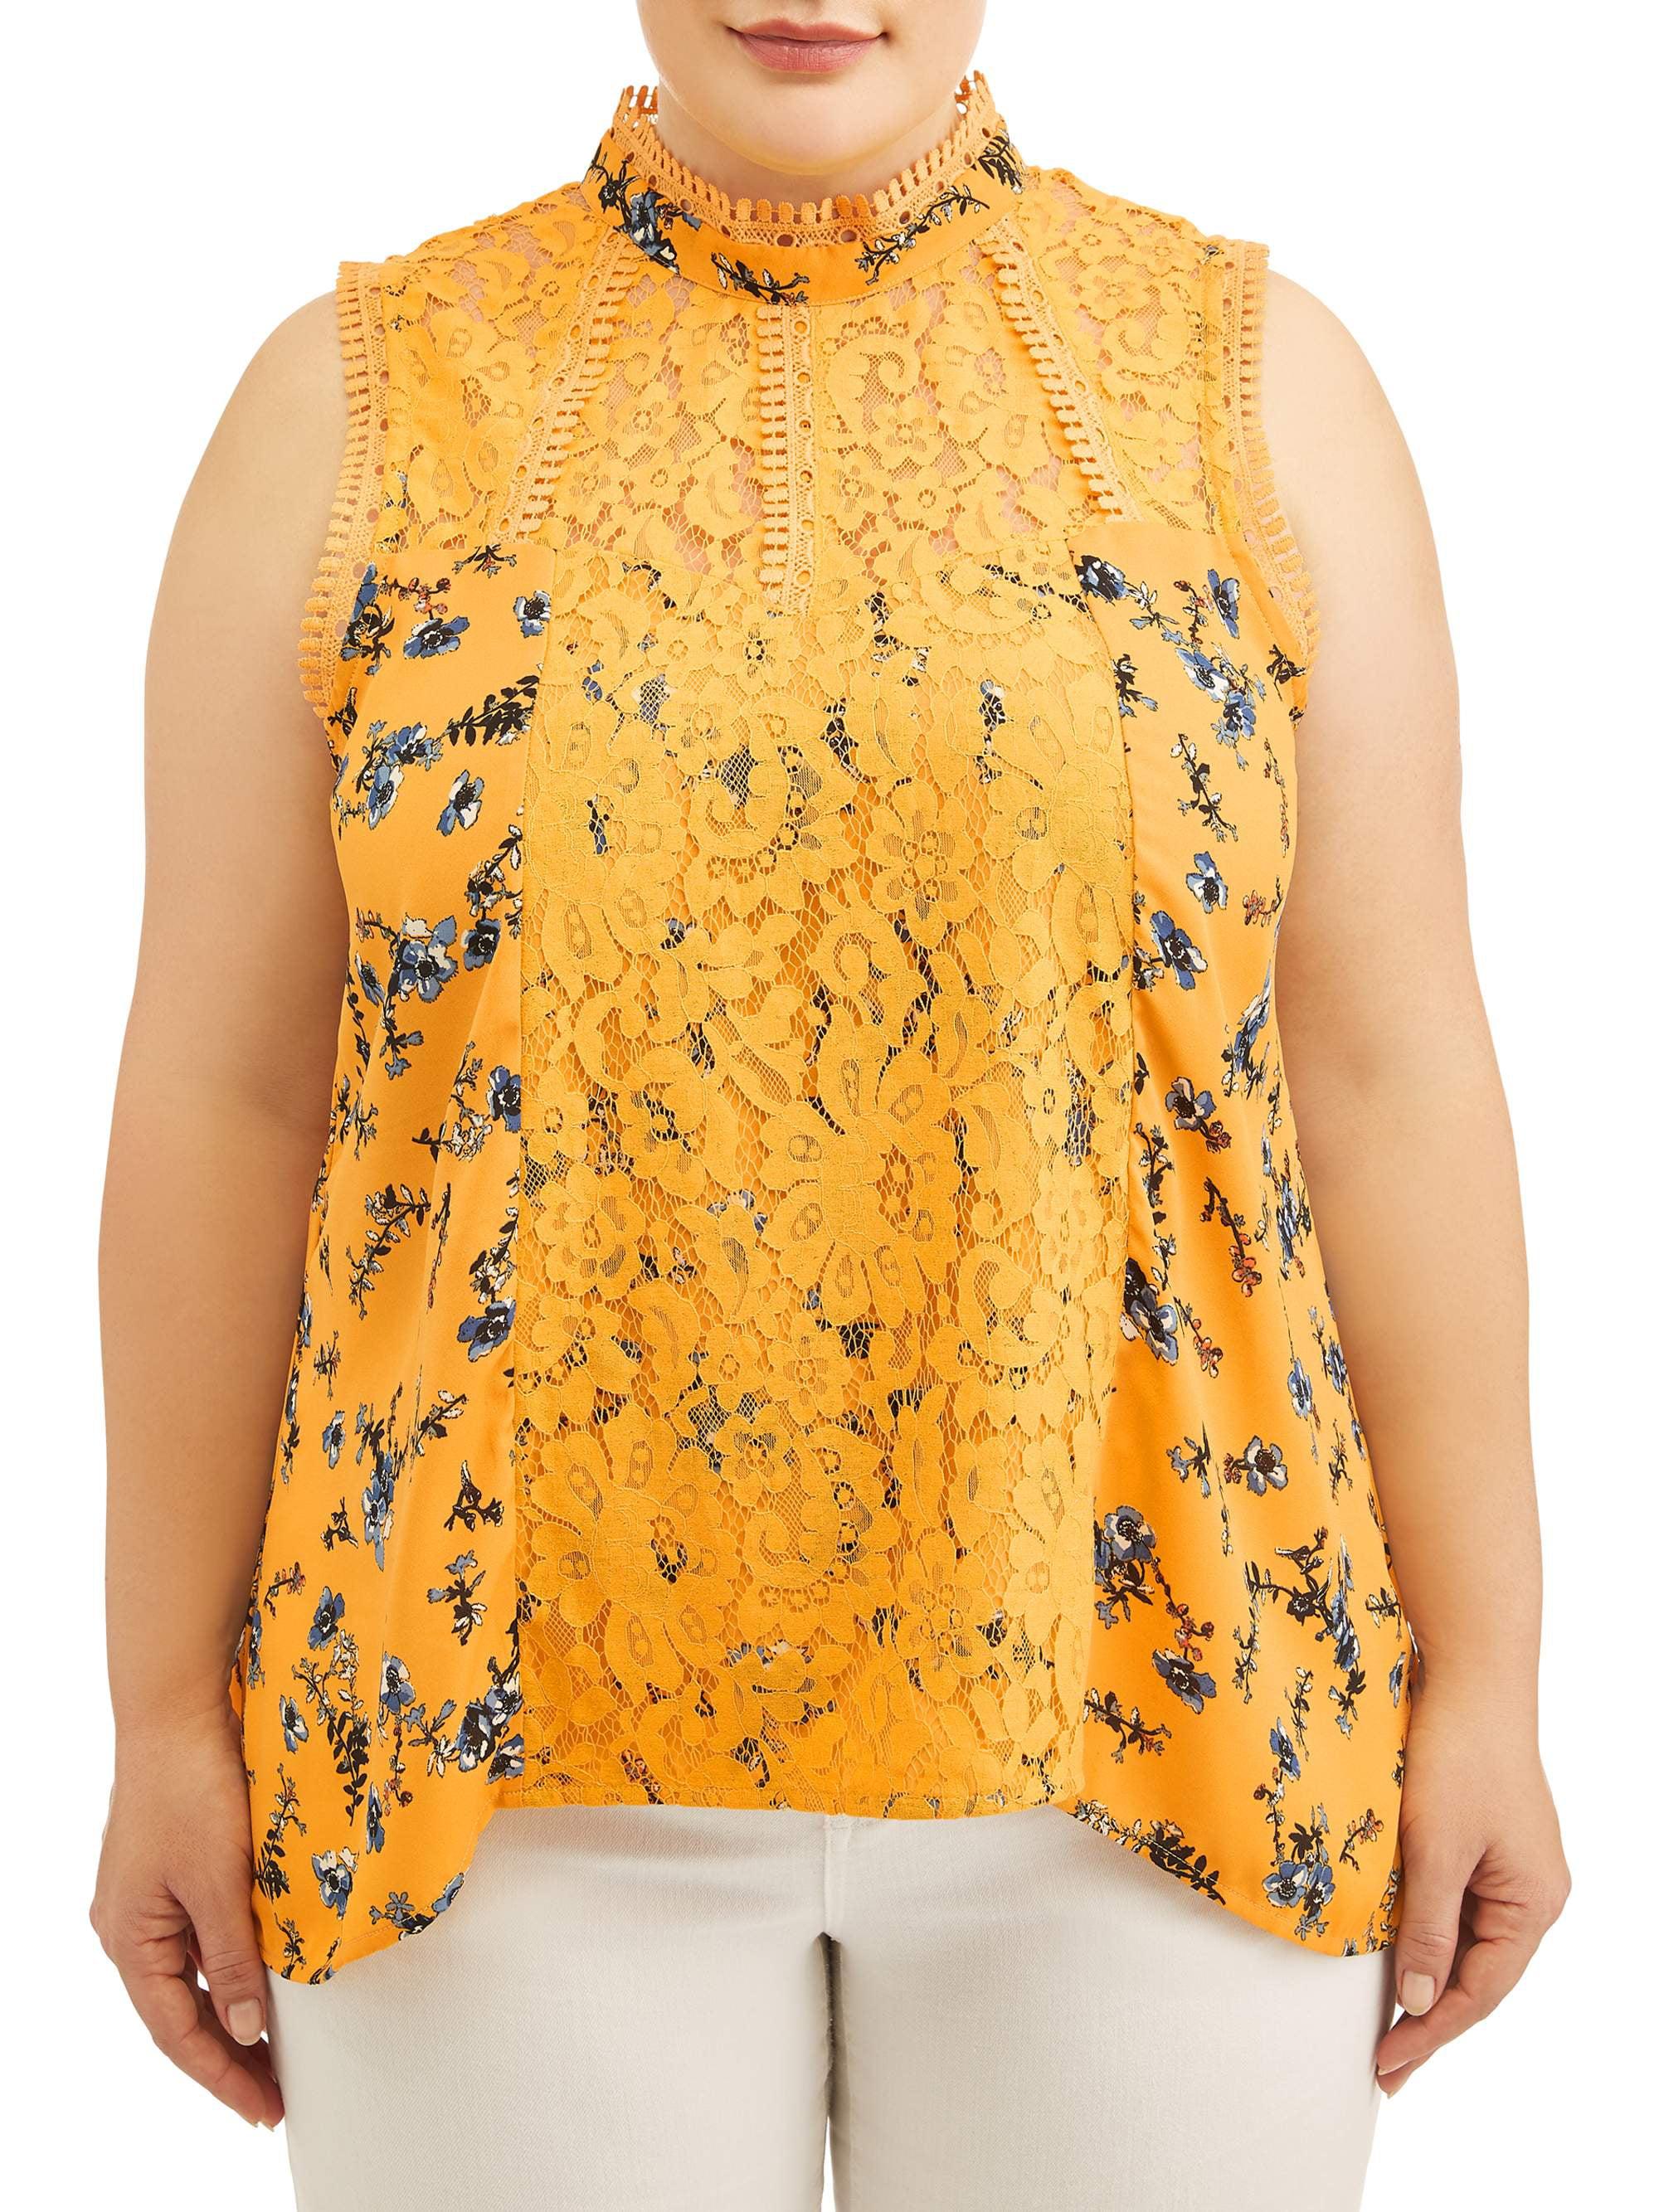 Women's Plus Size Printed Crochet Lace Victorian Top